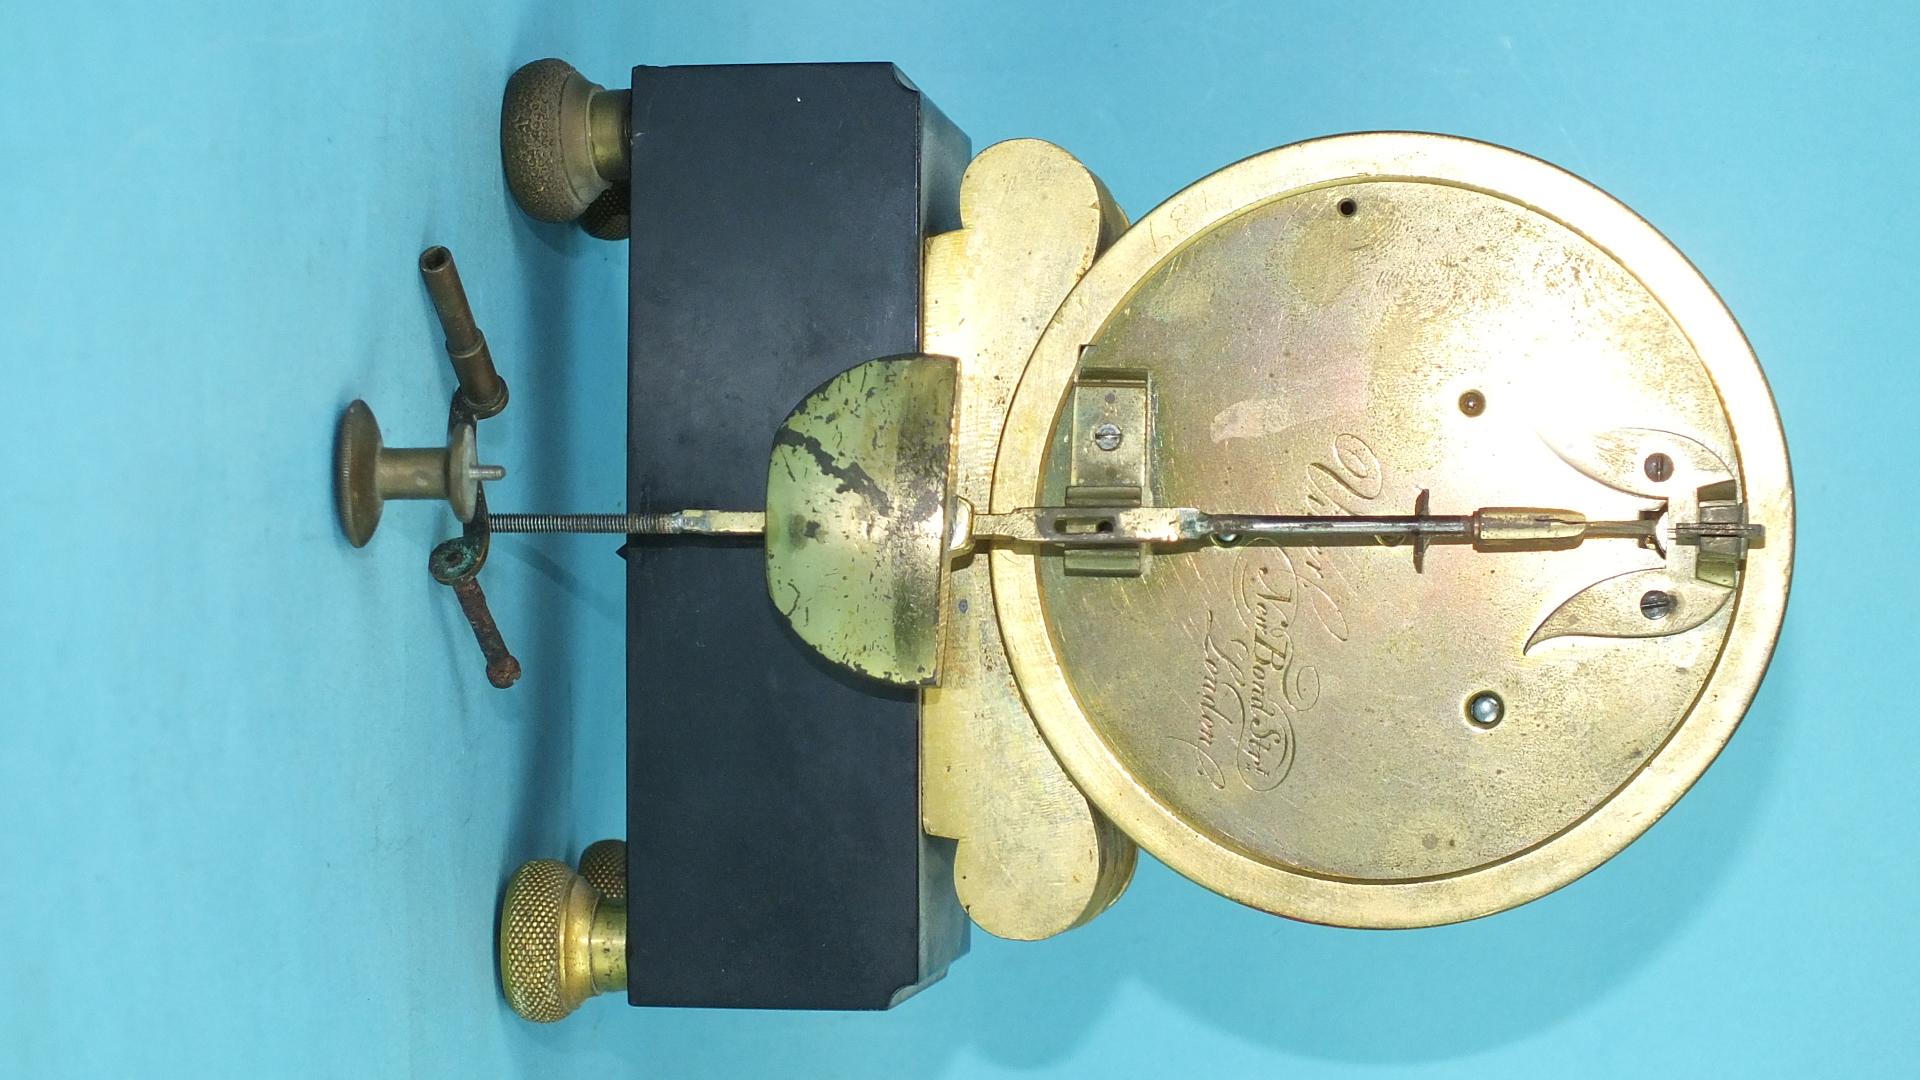 Lot 115 - Viner, New Bond Street, London, an early-19th century ormolu mantel clock, the circular engraved